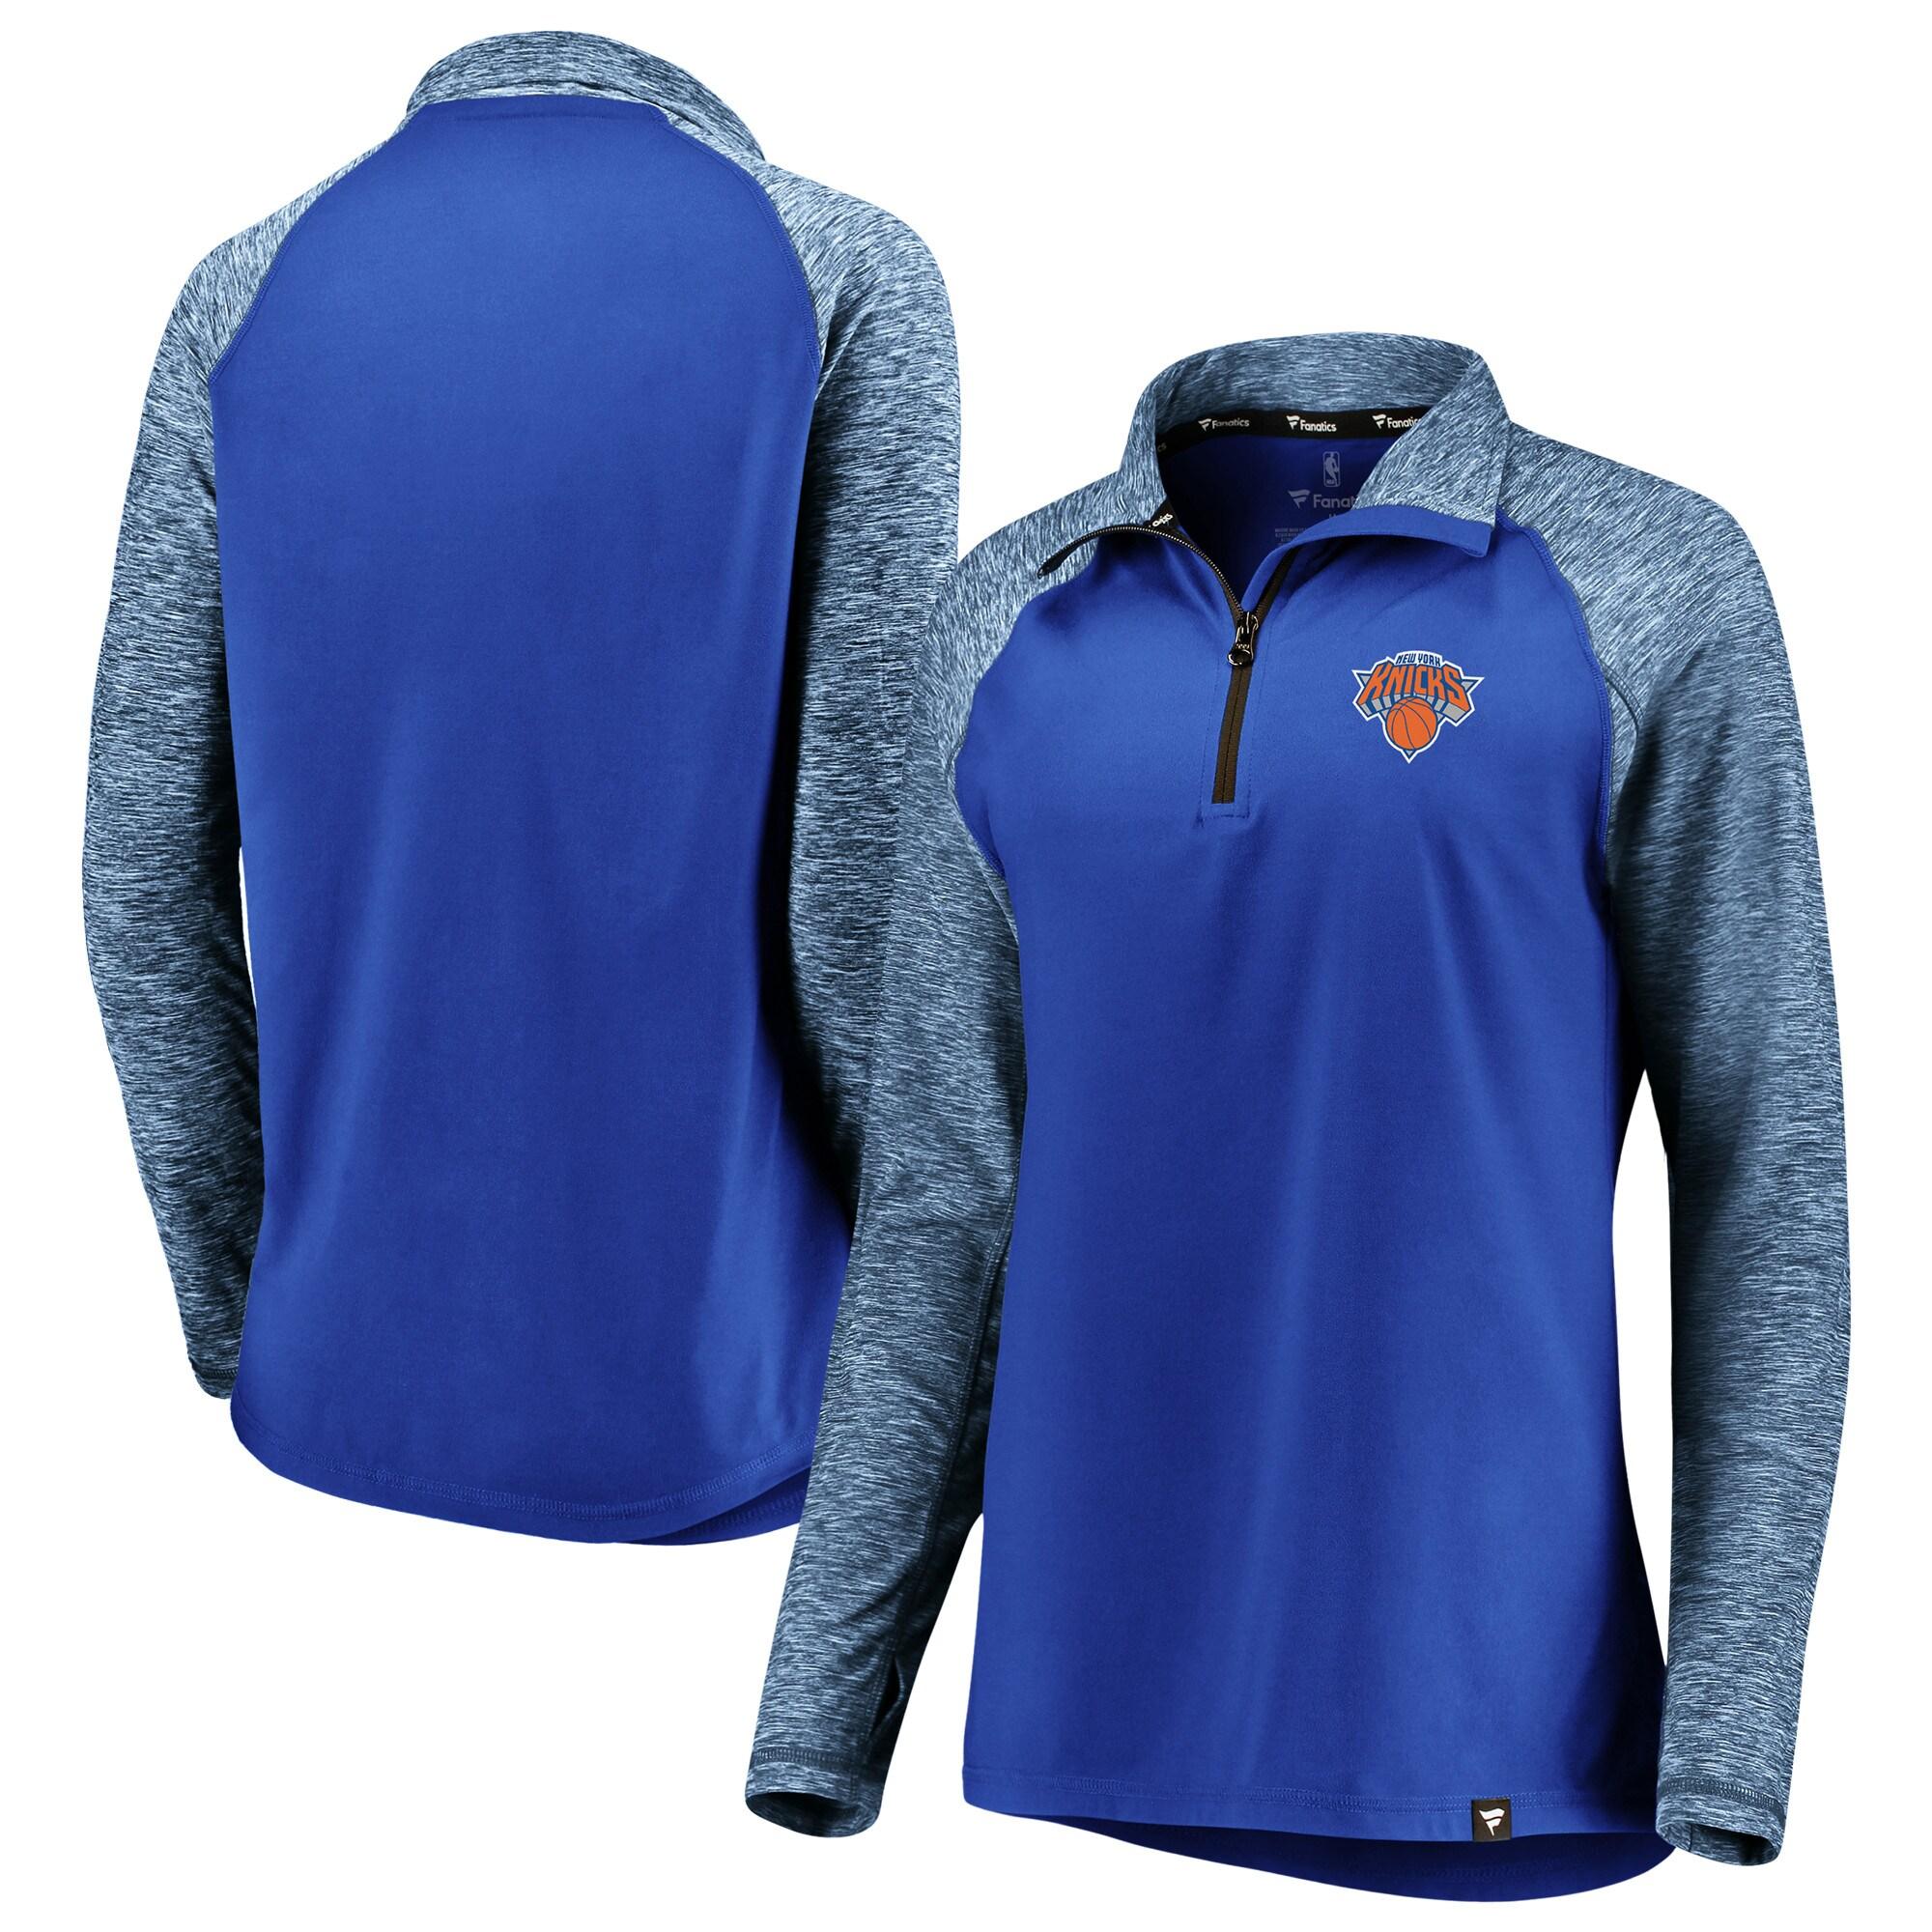 New York Knicks Fanatics Branded Women's Made to Move Static Performance Raglan Sleeve Quarter-Zip Pullover Jacket - Blue/Heathered Blue